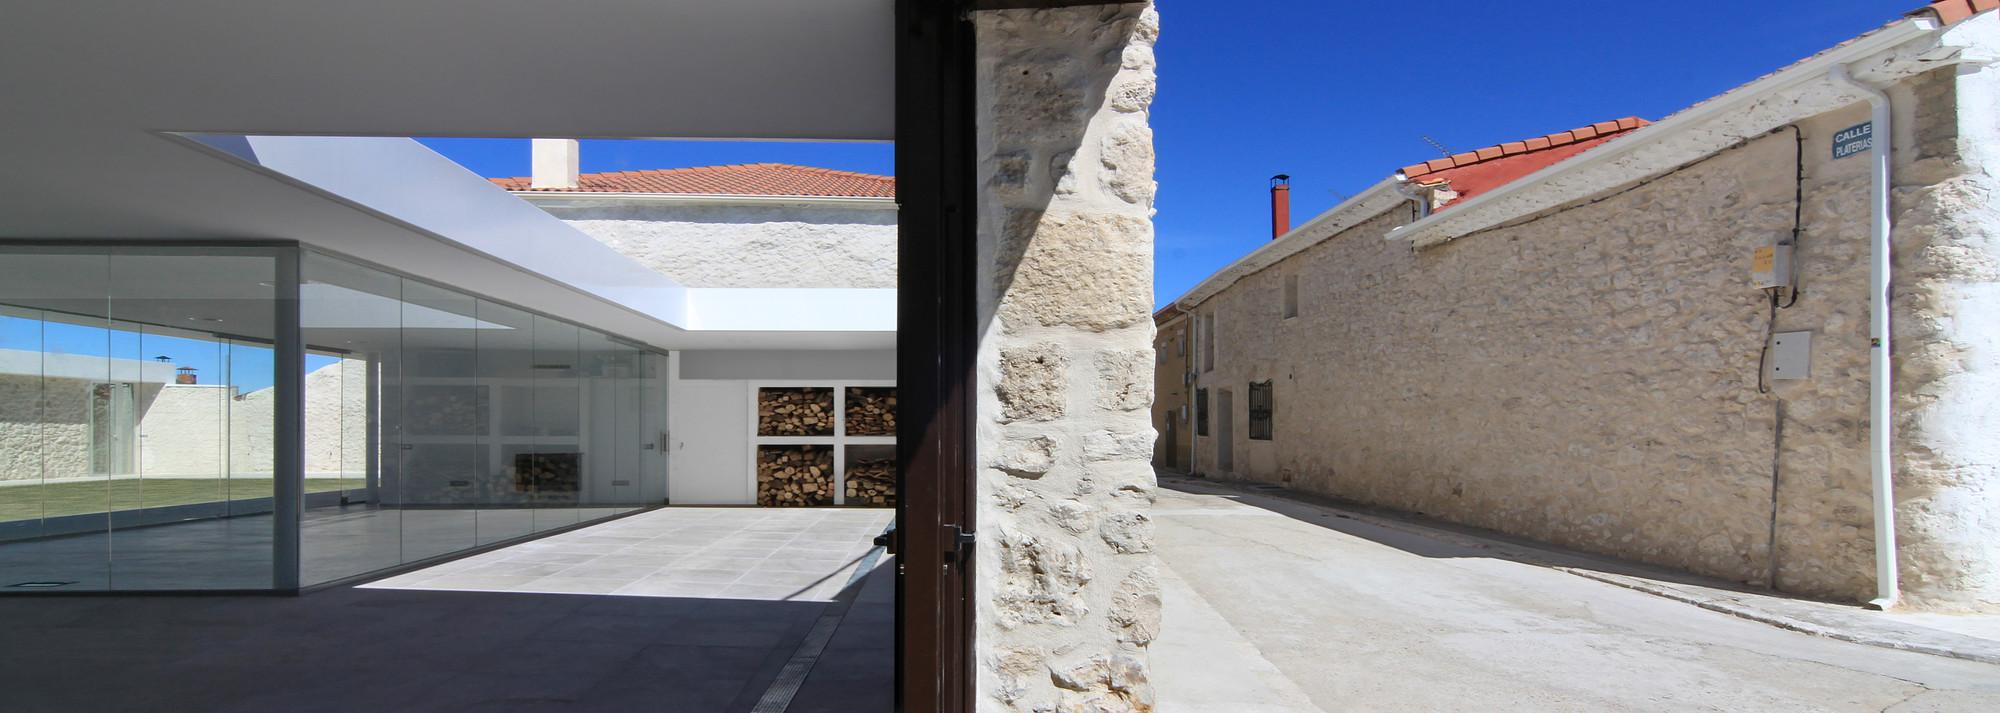 Rehabilitación patio en Santibañez de Valcorba / Óscar Miguel Ares Álvarez, © Jesús J. Ruiz Alonso